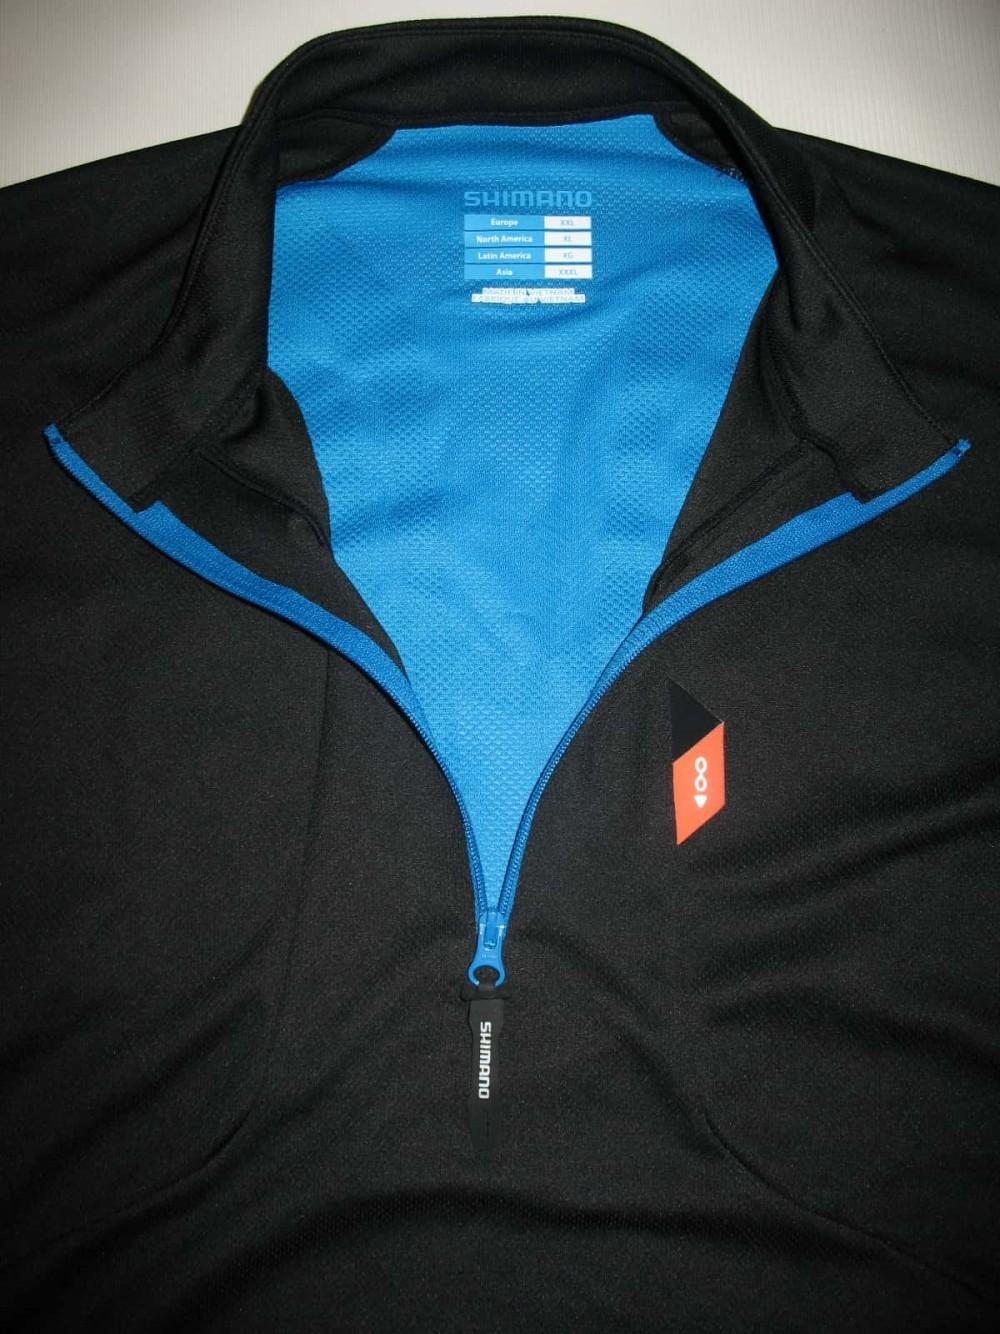 Веломайка SHIMANO trail bike jersey (размер XXL) - 2